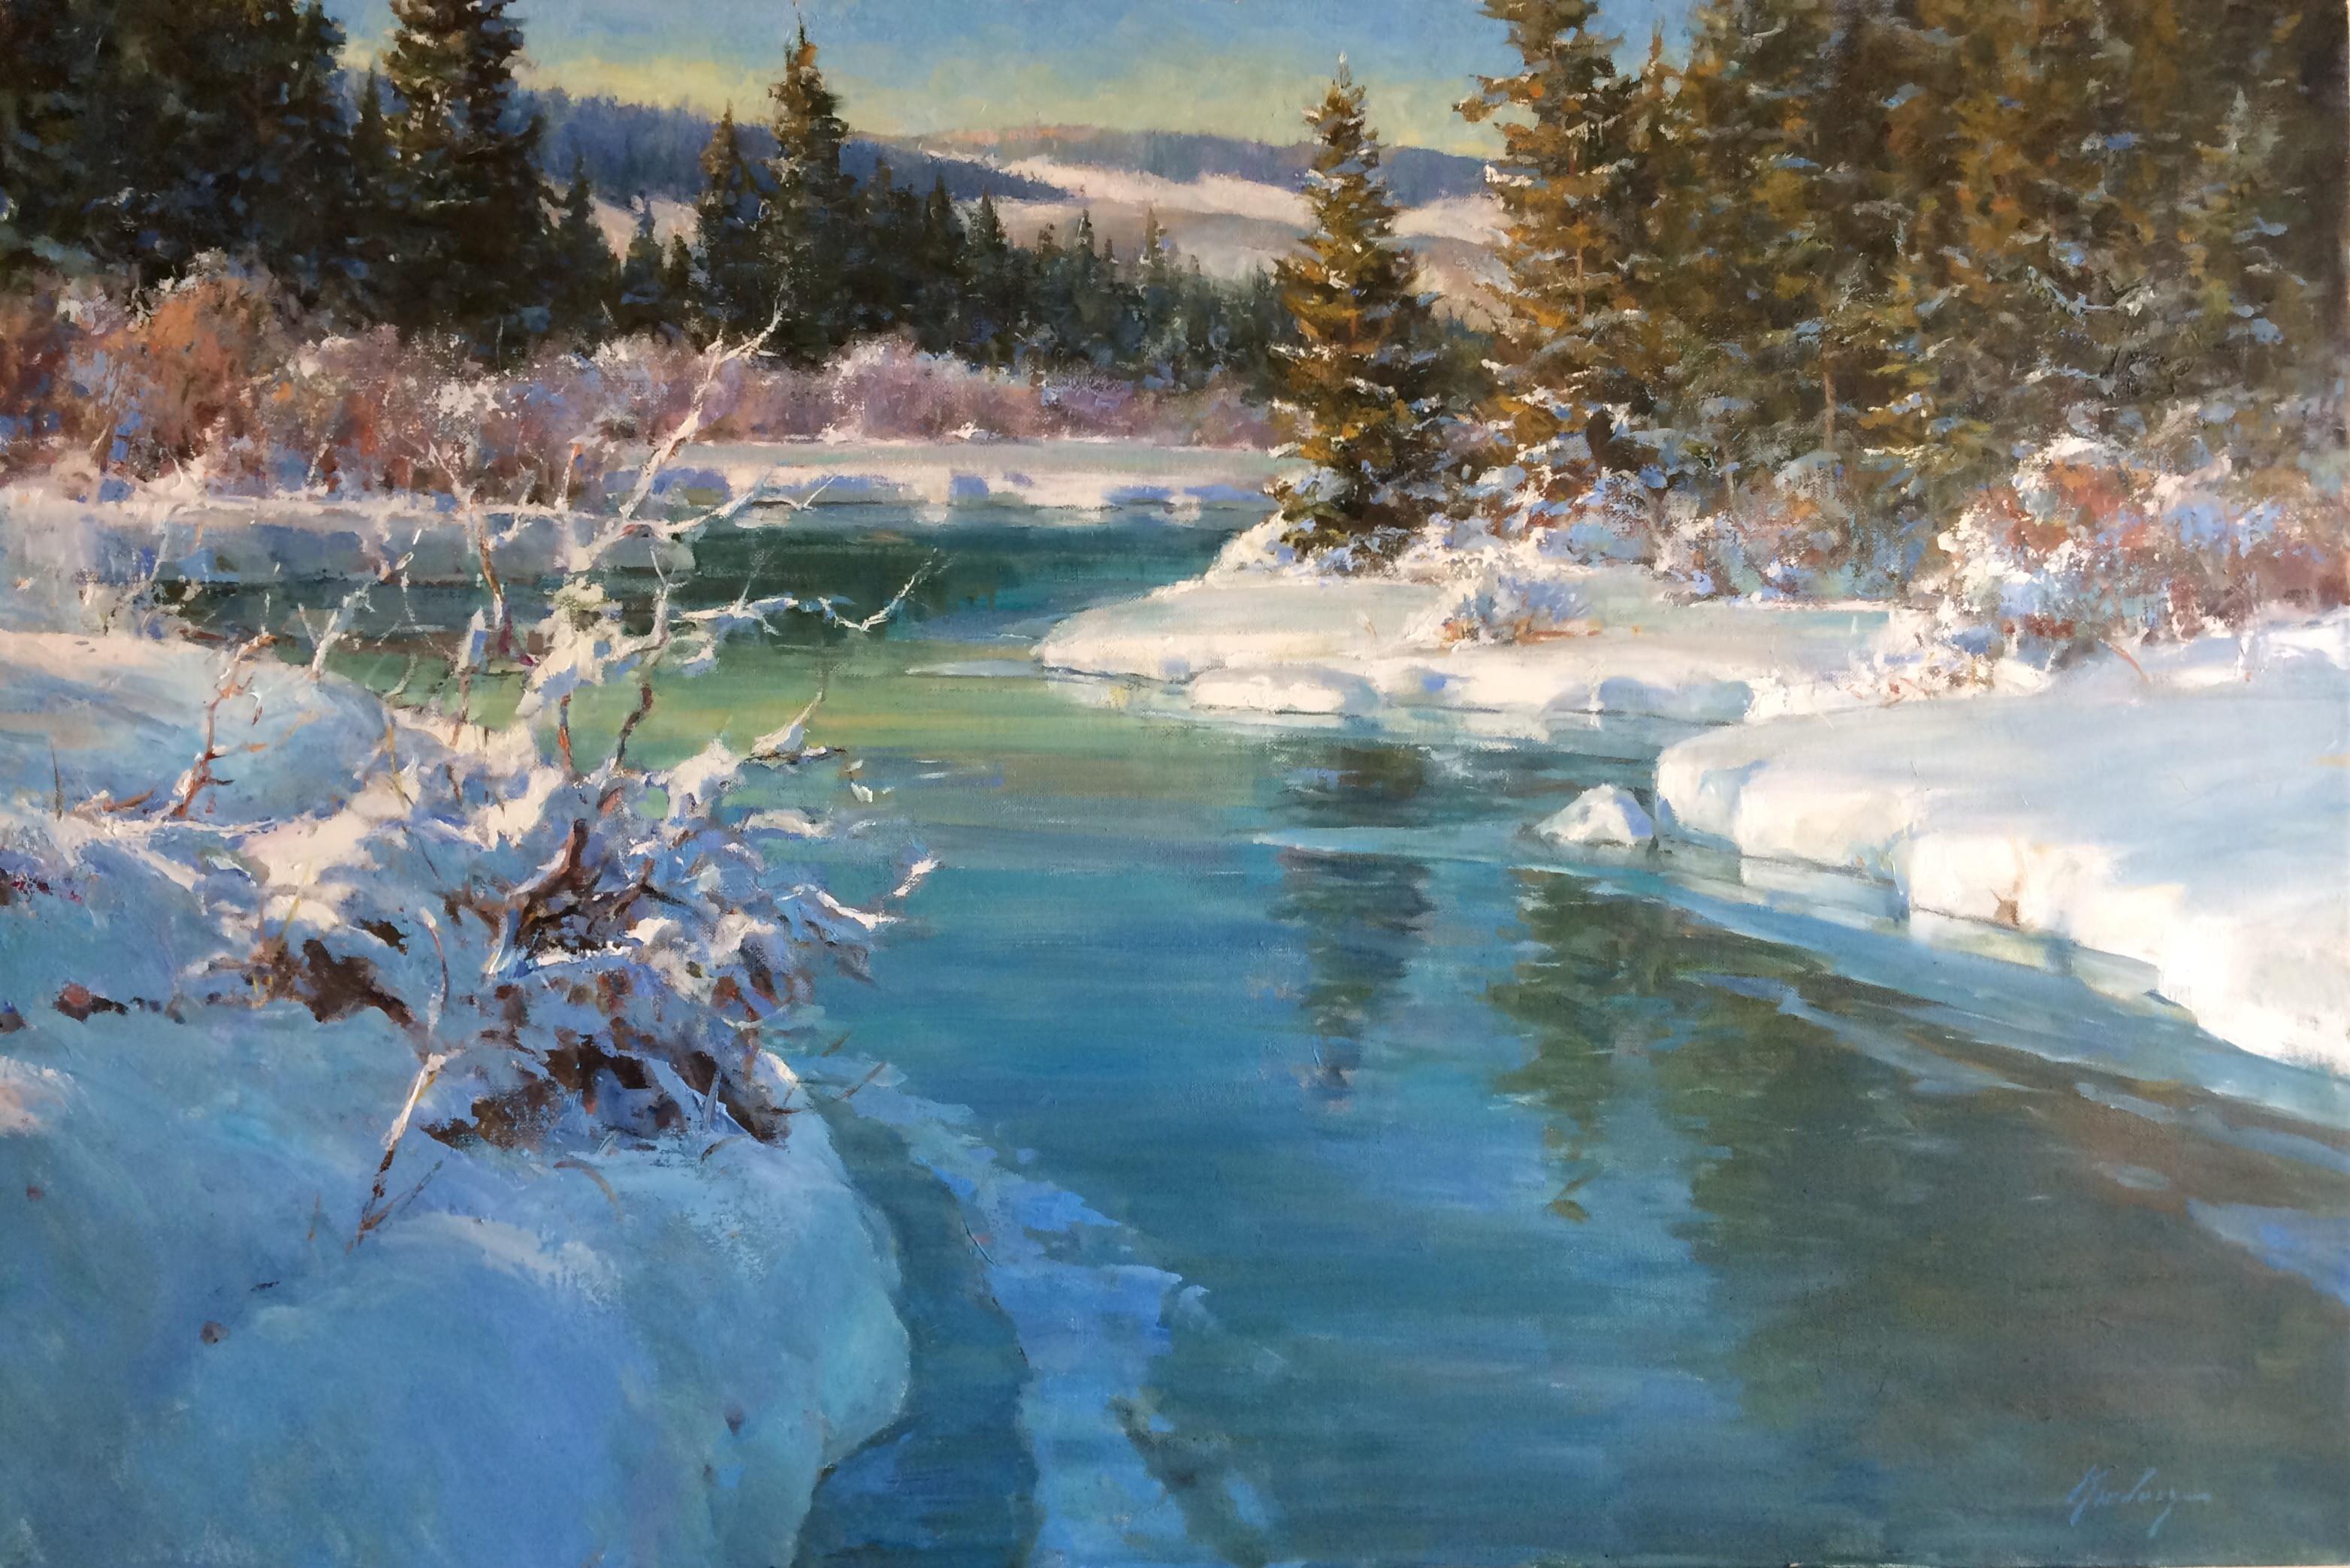 Oil Painting Workshop with Chuck Mardosz